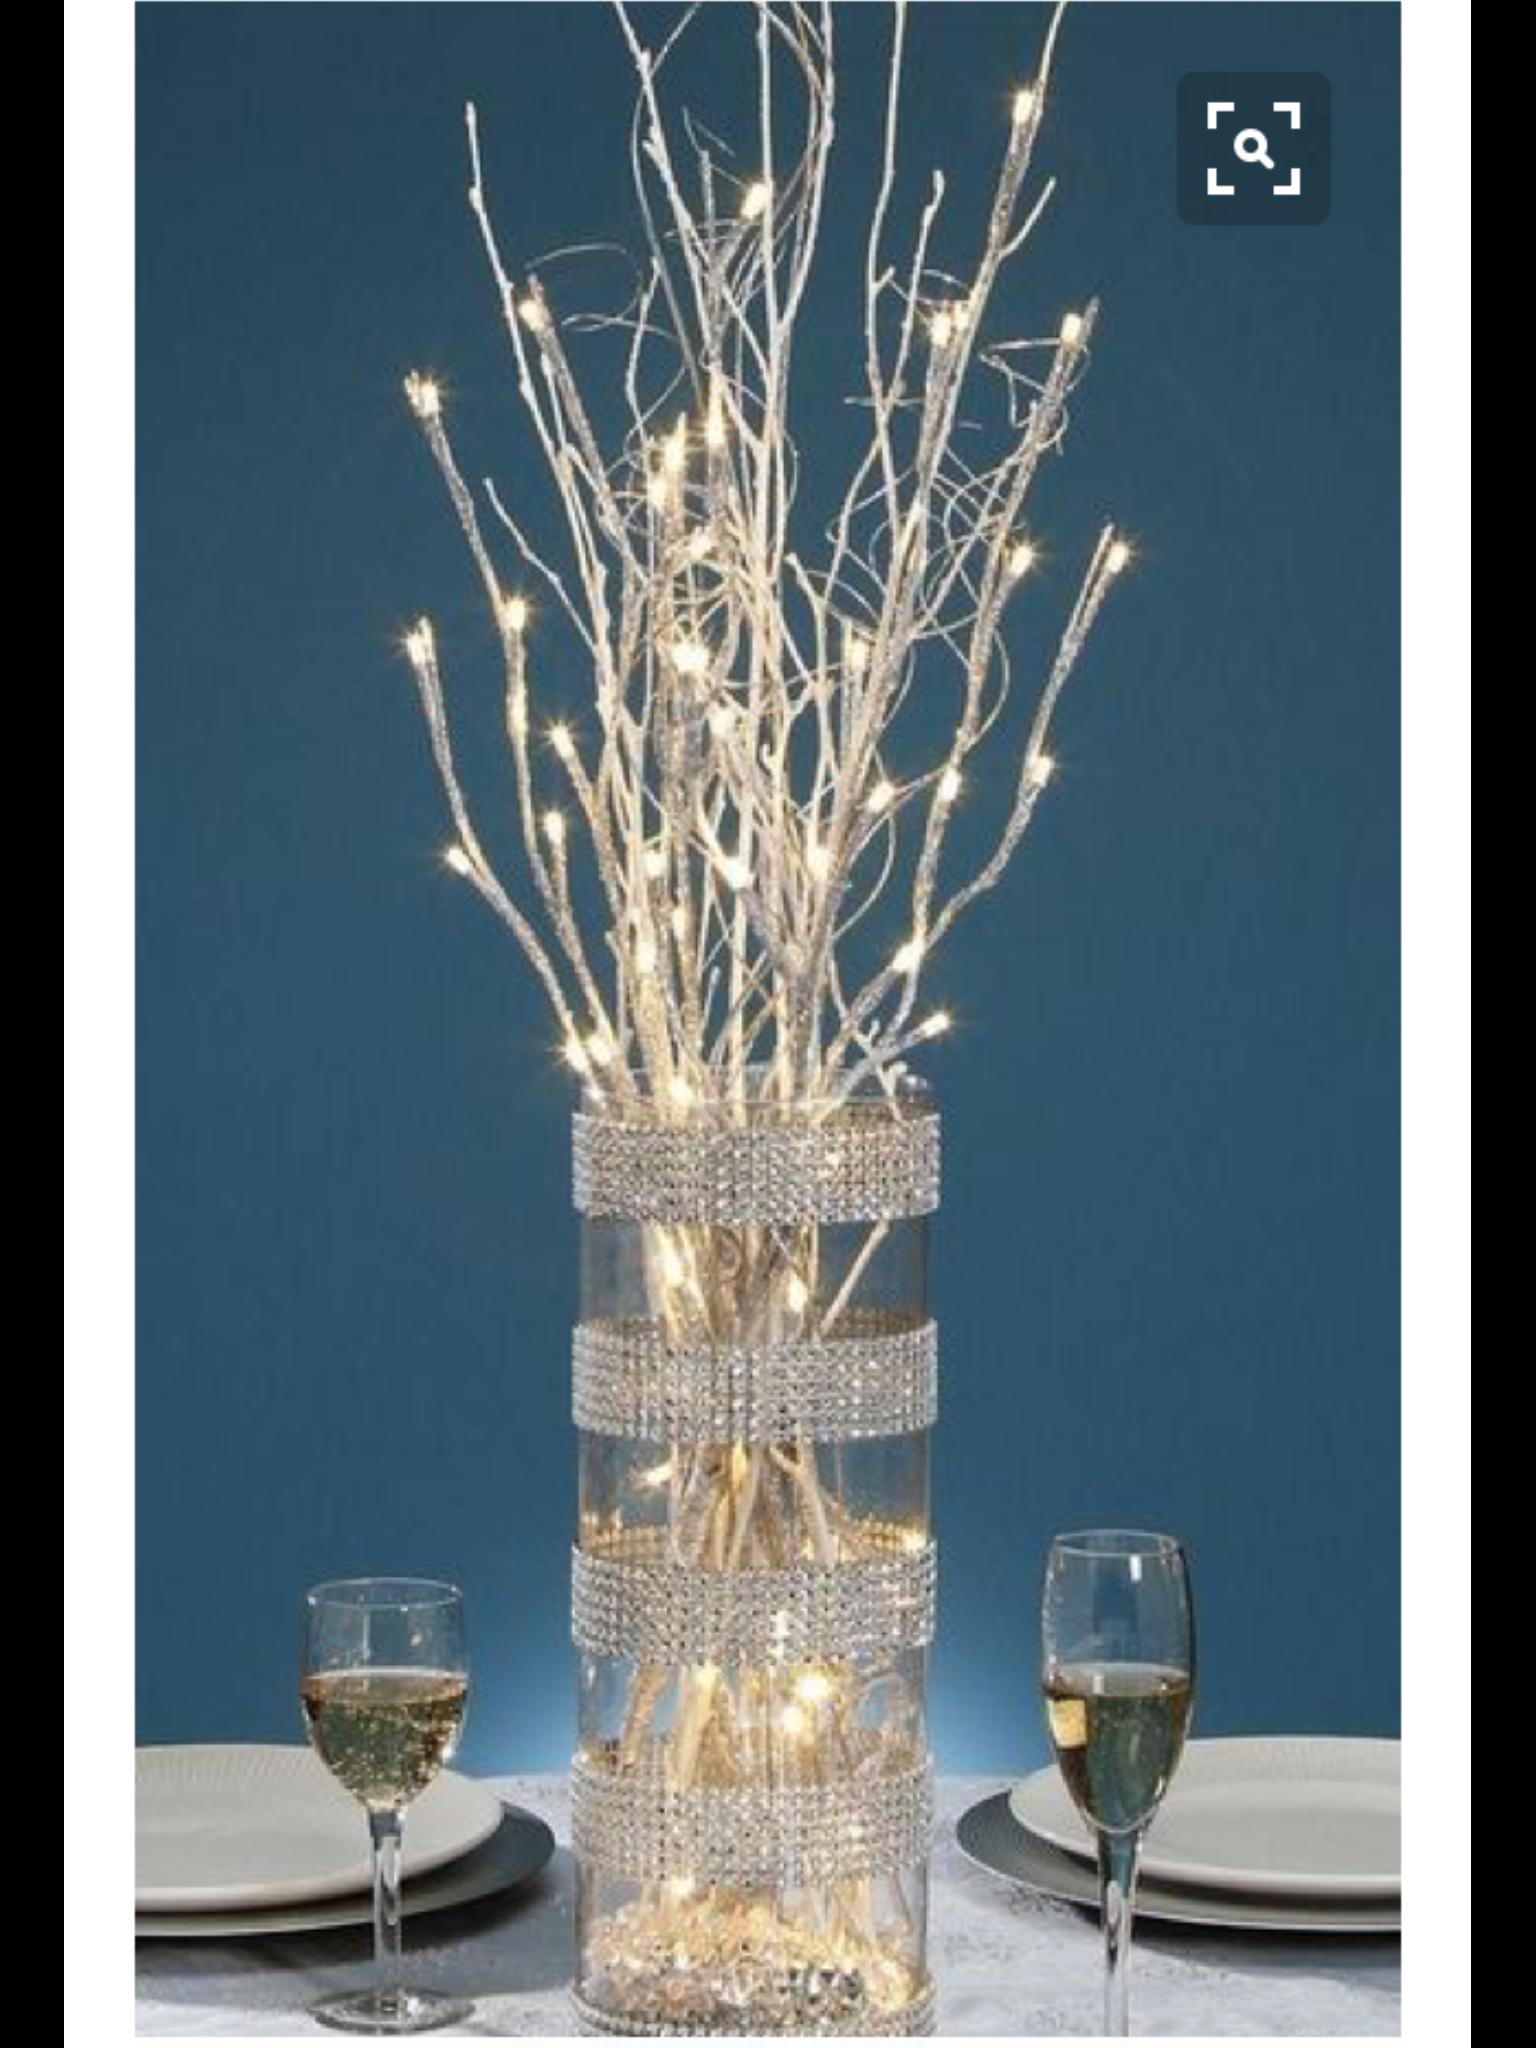 Groovy Lighted Branch Centerpiece Thats Entertainment In 2019 Interior Design Ideas Clesiryabchikinfo